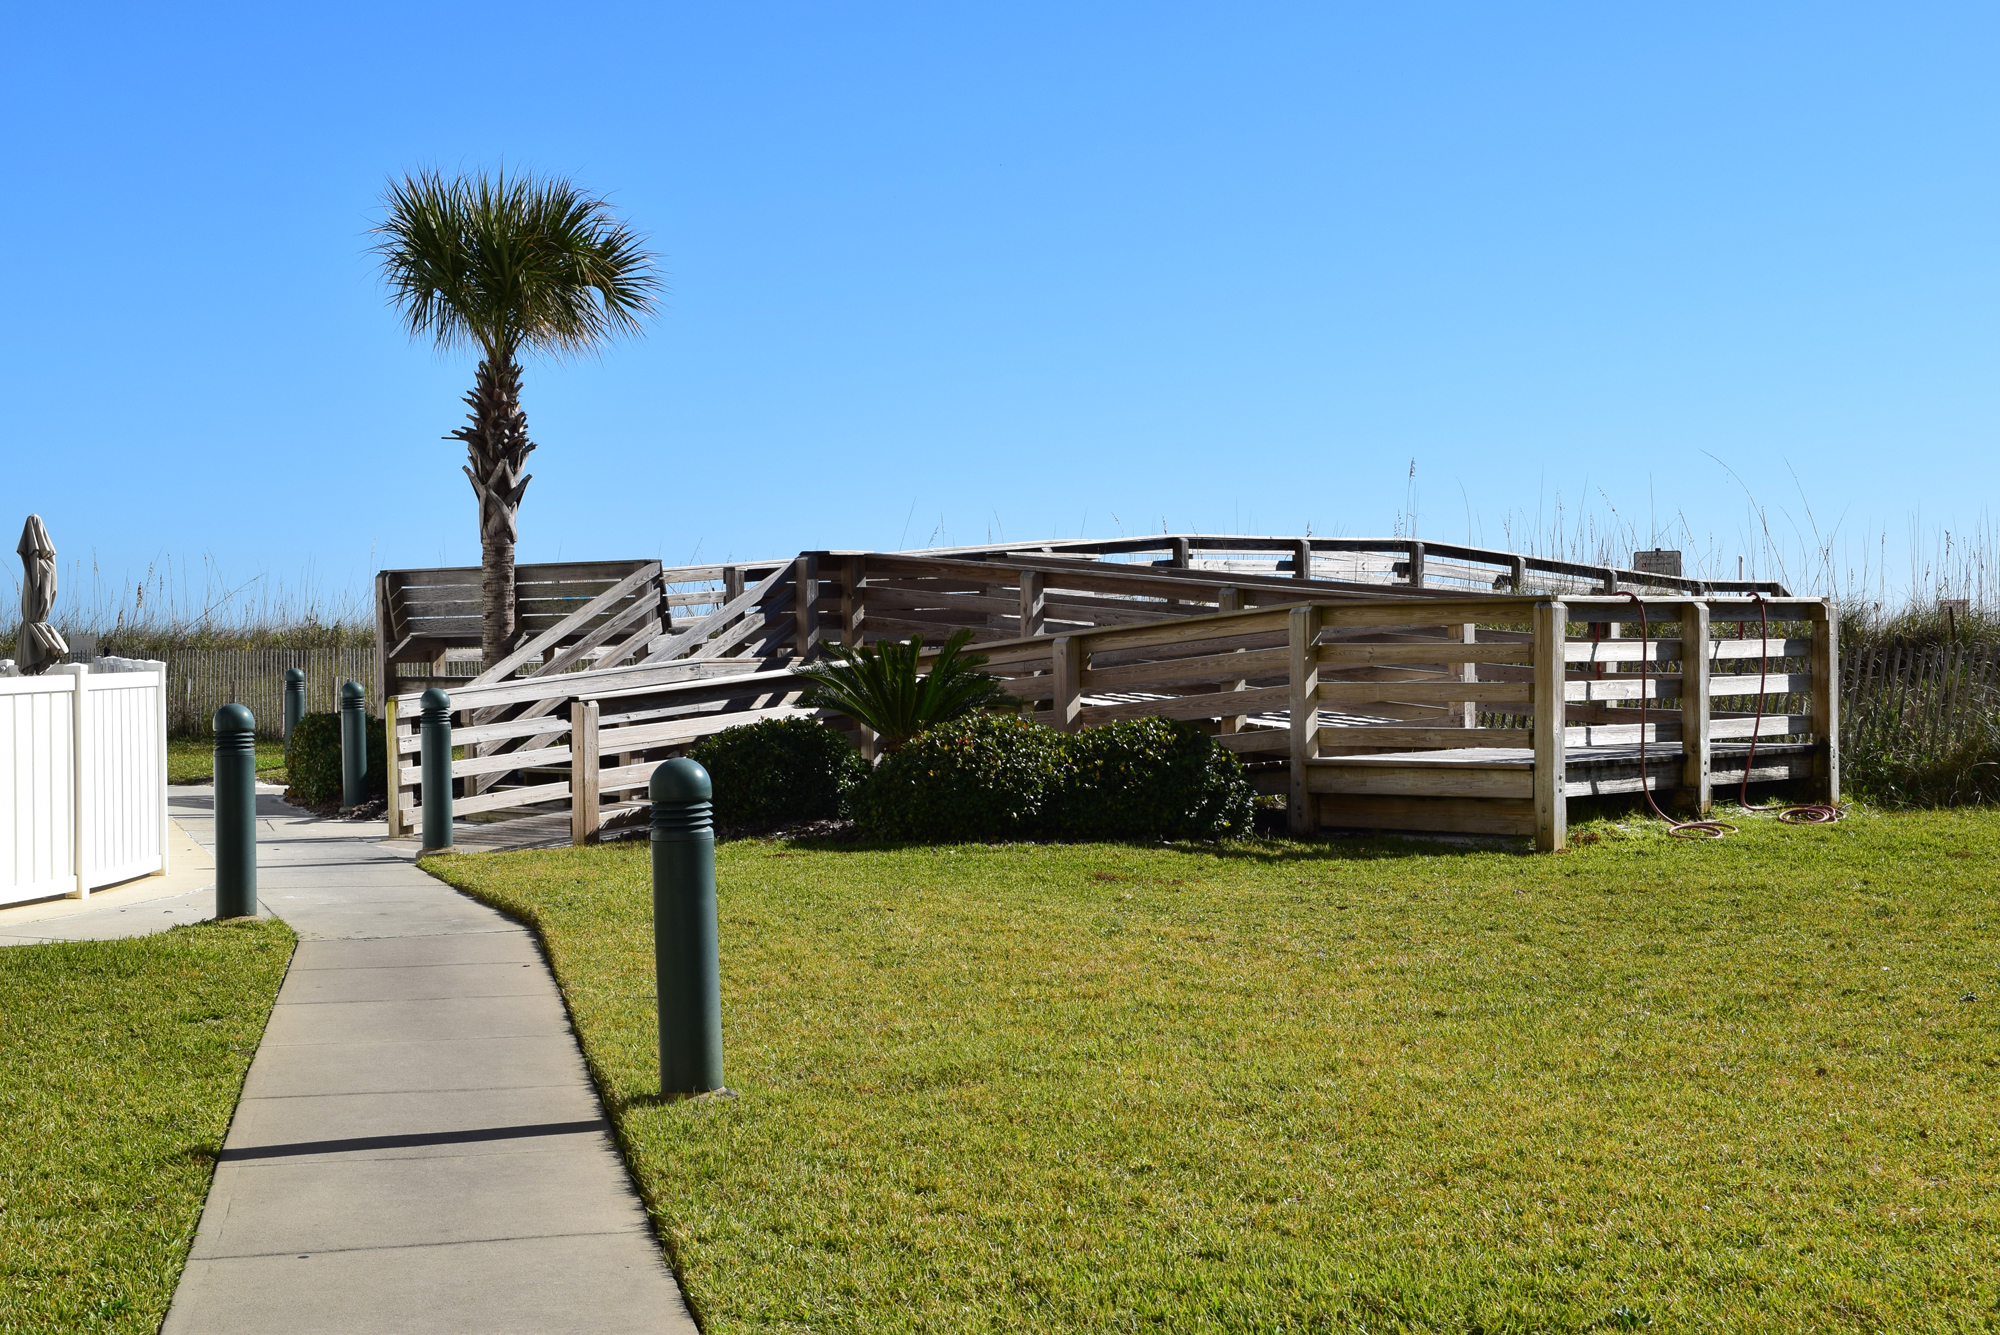 Regency Towers #505E - Fantasea Condo rental in Regency Towers Pensacola Beach in Pensacola Beach Florida - #30